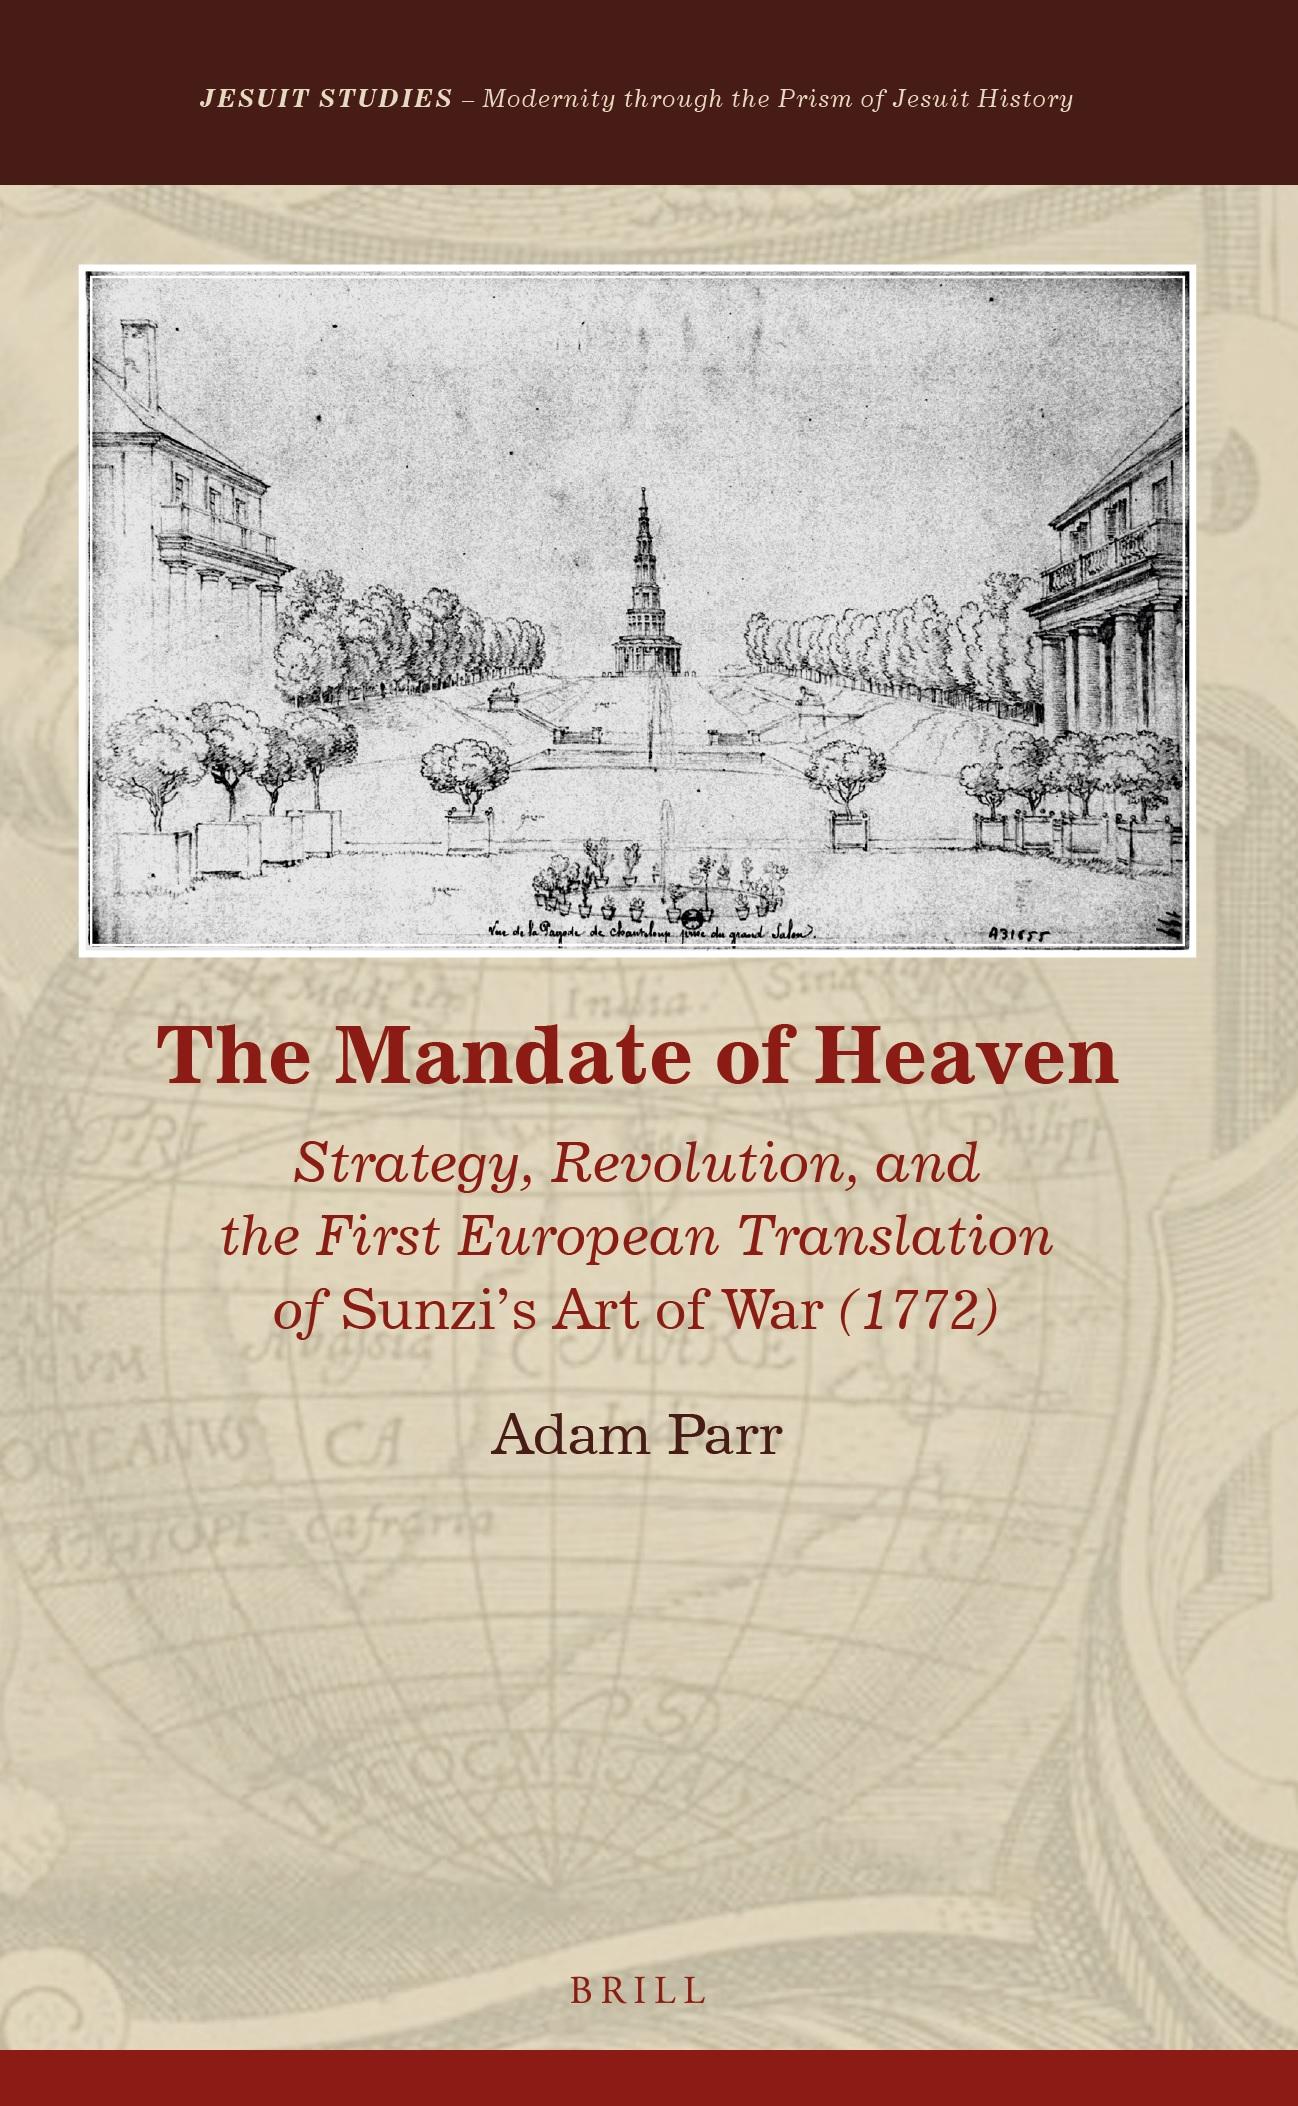 Adam Parr The Mandate of Heaven Brill 2019.jpg